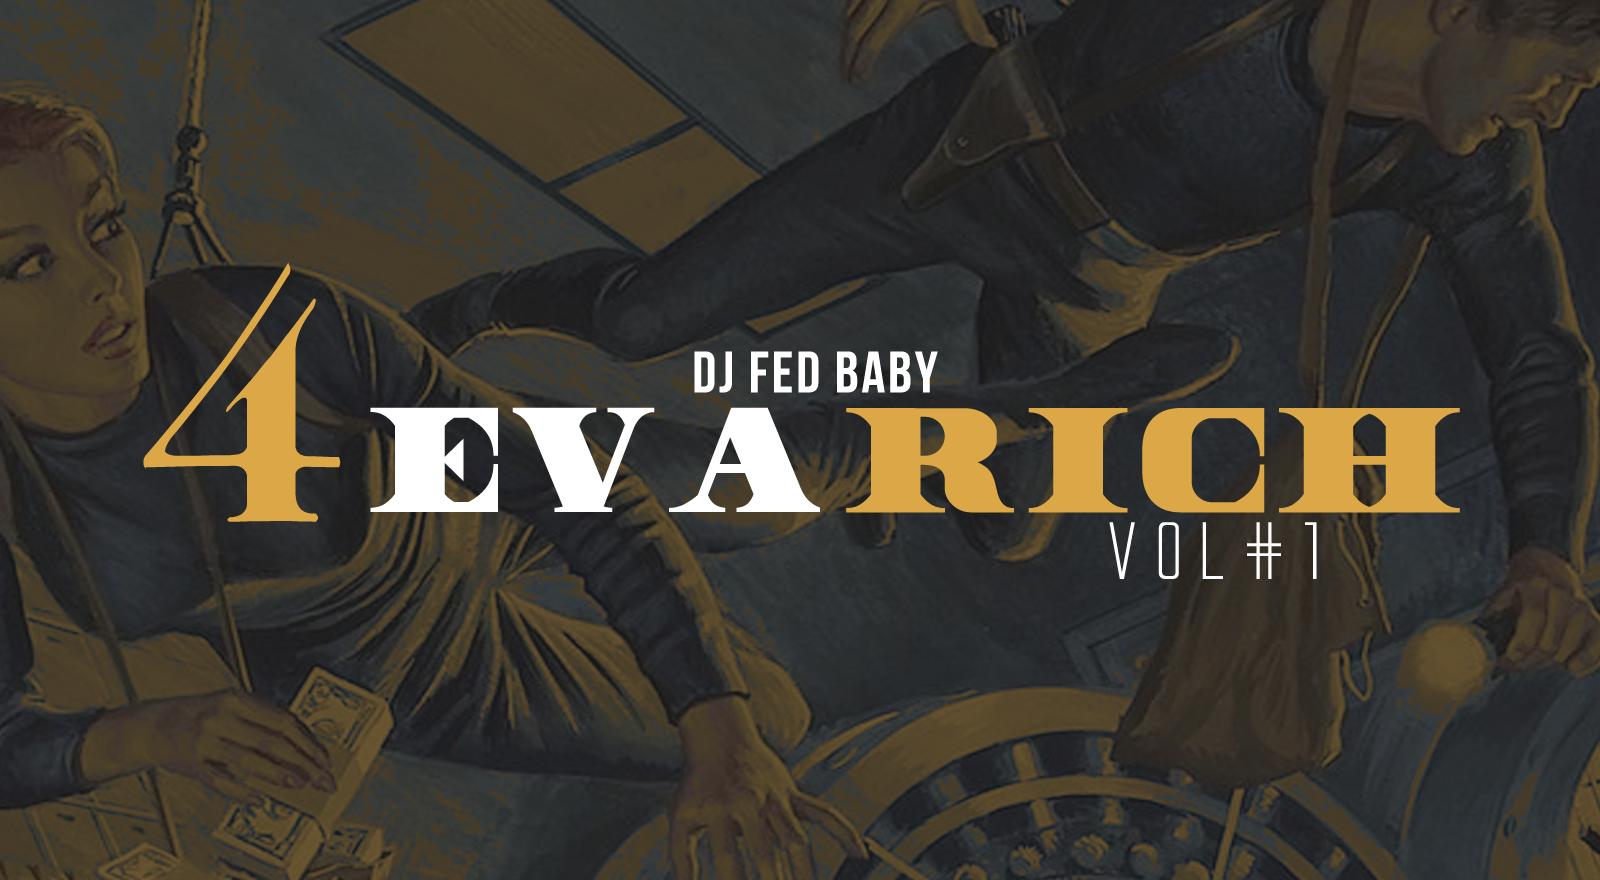 DJ FED BABY